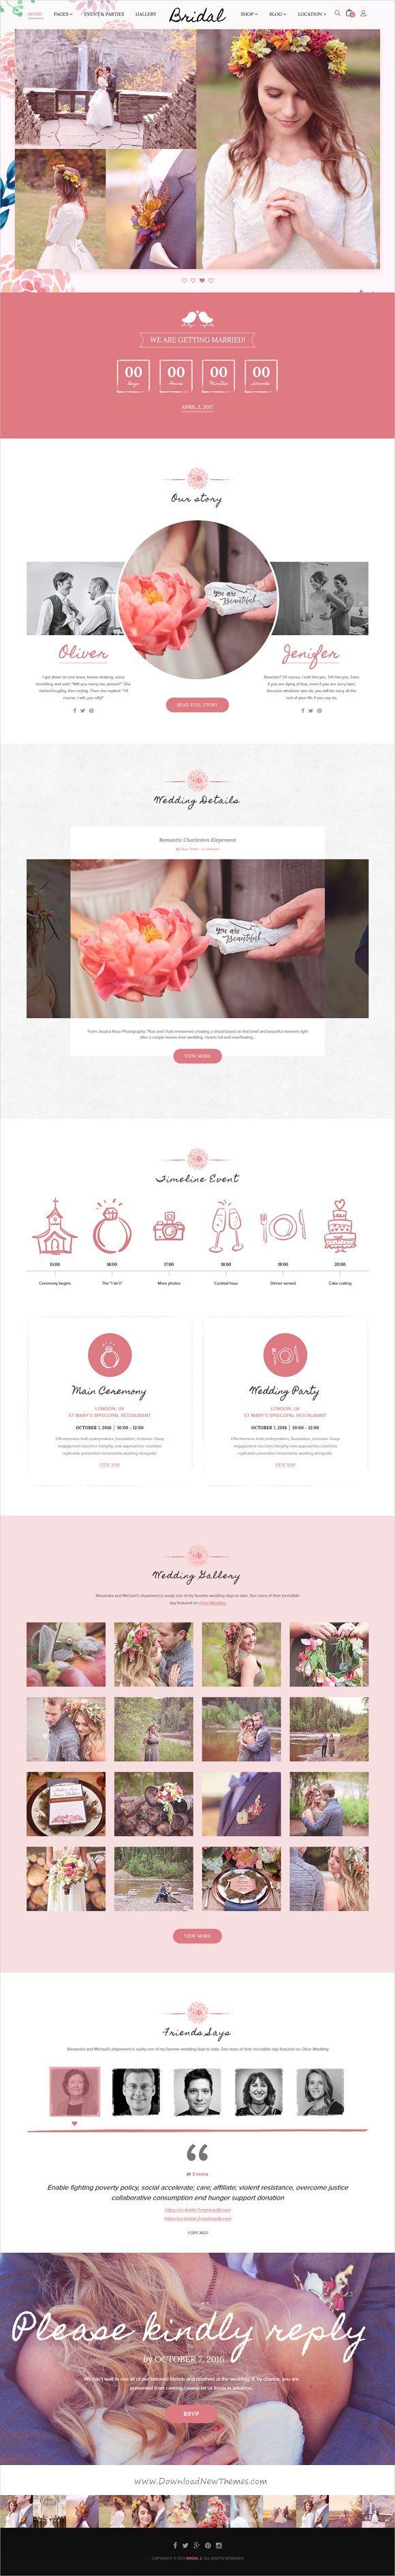 Best 25 invitation websites ideas on pinterest diy wedding best 25 invitation websites ideas on pinterest diy wedding stationery packages beauty portfolio ideas and folder diy stopboris Images